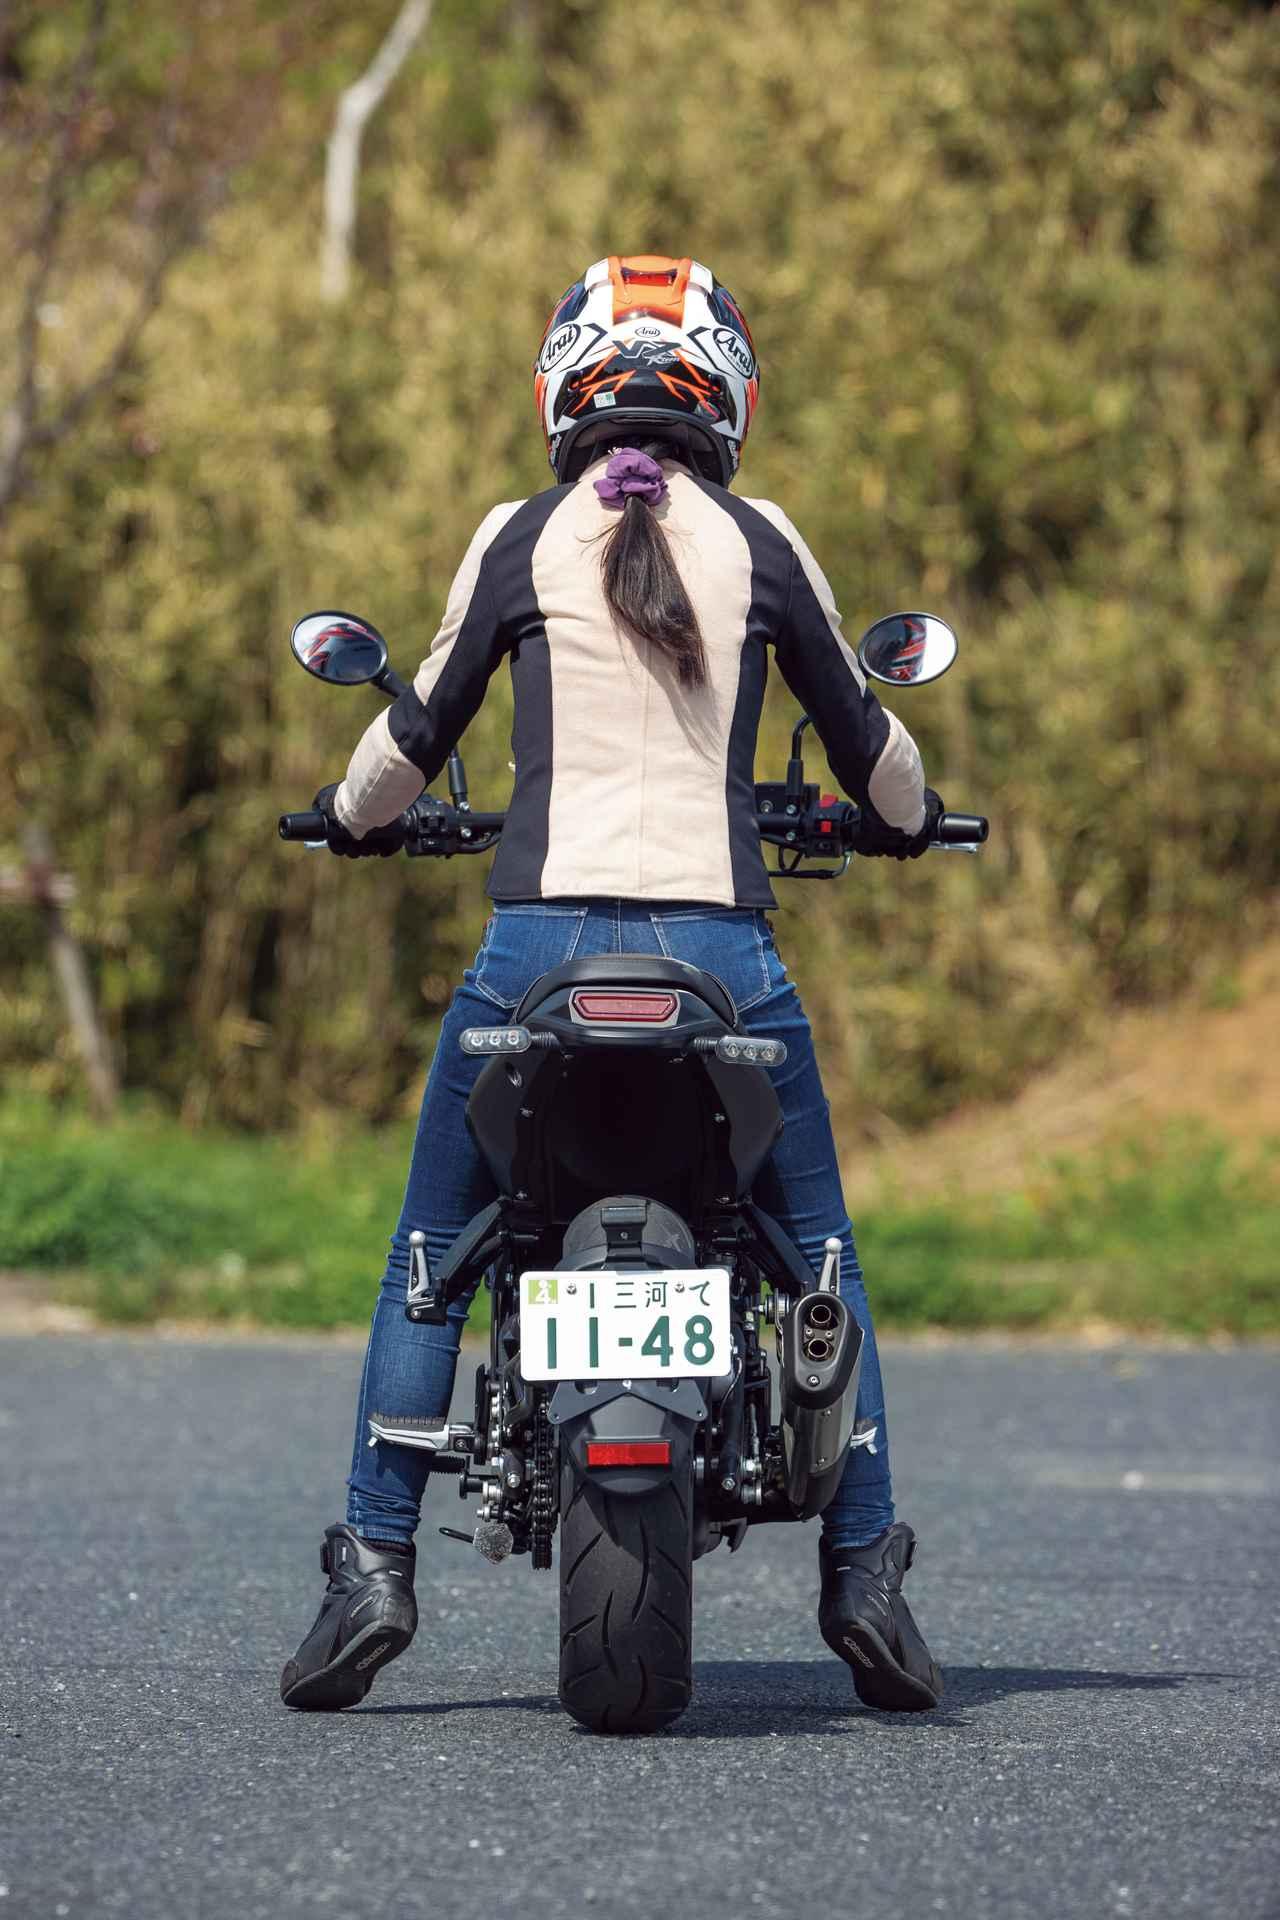 Images : 6番目の画像 - 【写真13枚】ベネリ「レオンチーノ250」 - webオートバイ